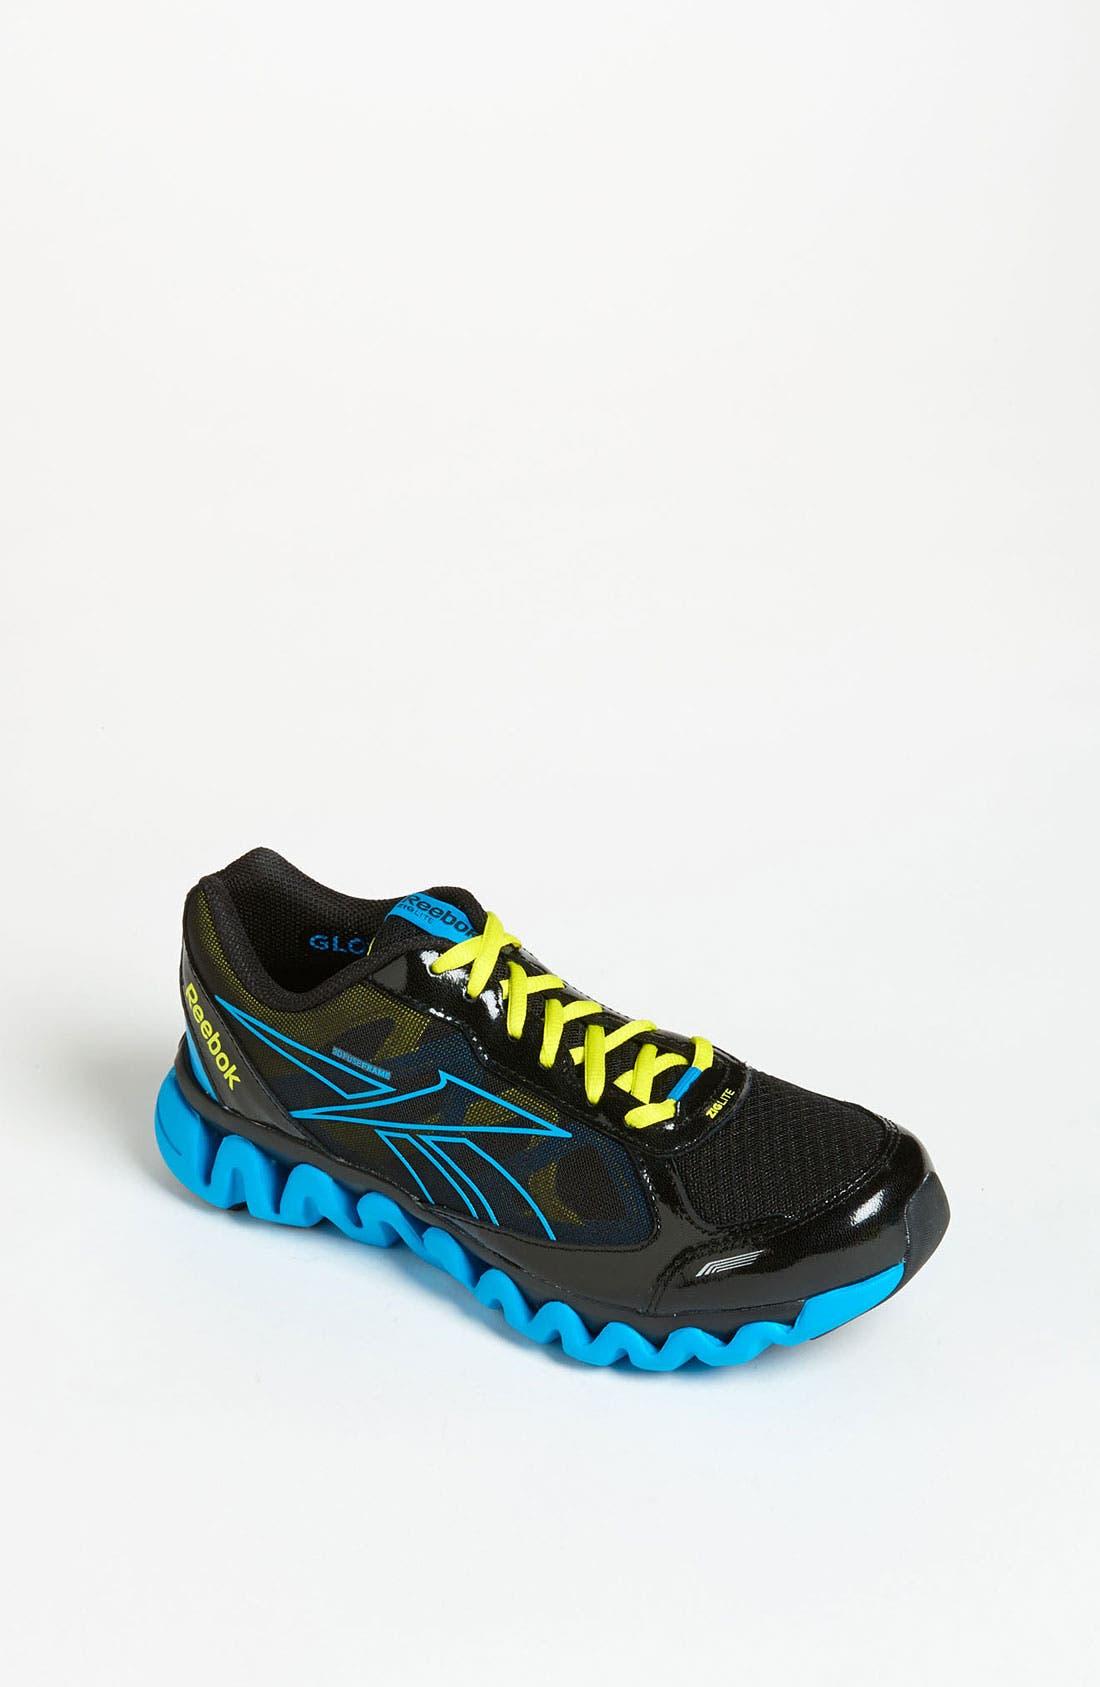 Main Image - Reebok 'ZigLite Rush' Sneaker (Big Kid)